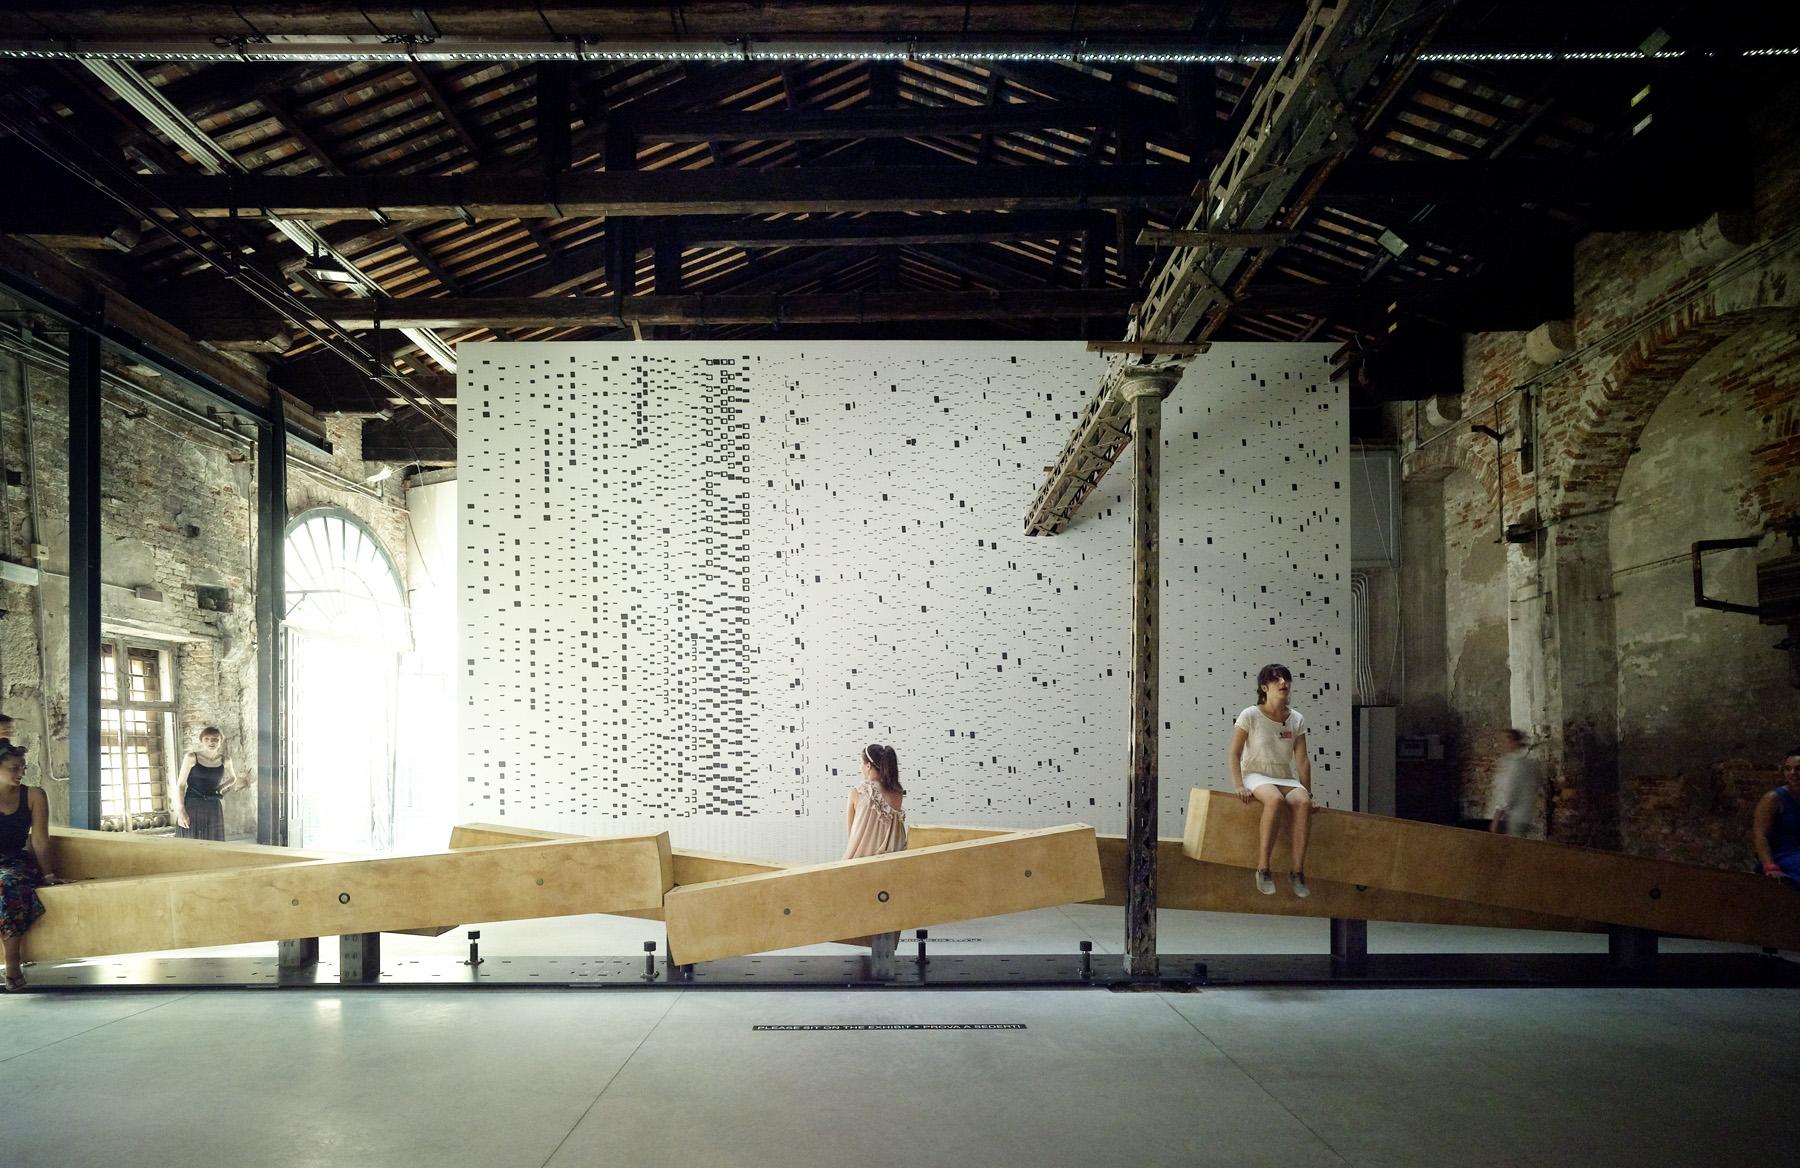 Heneghan Peng Architects Pavilion Of Ireland Venice